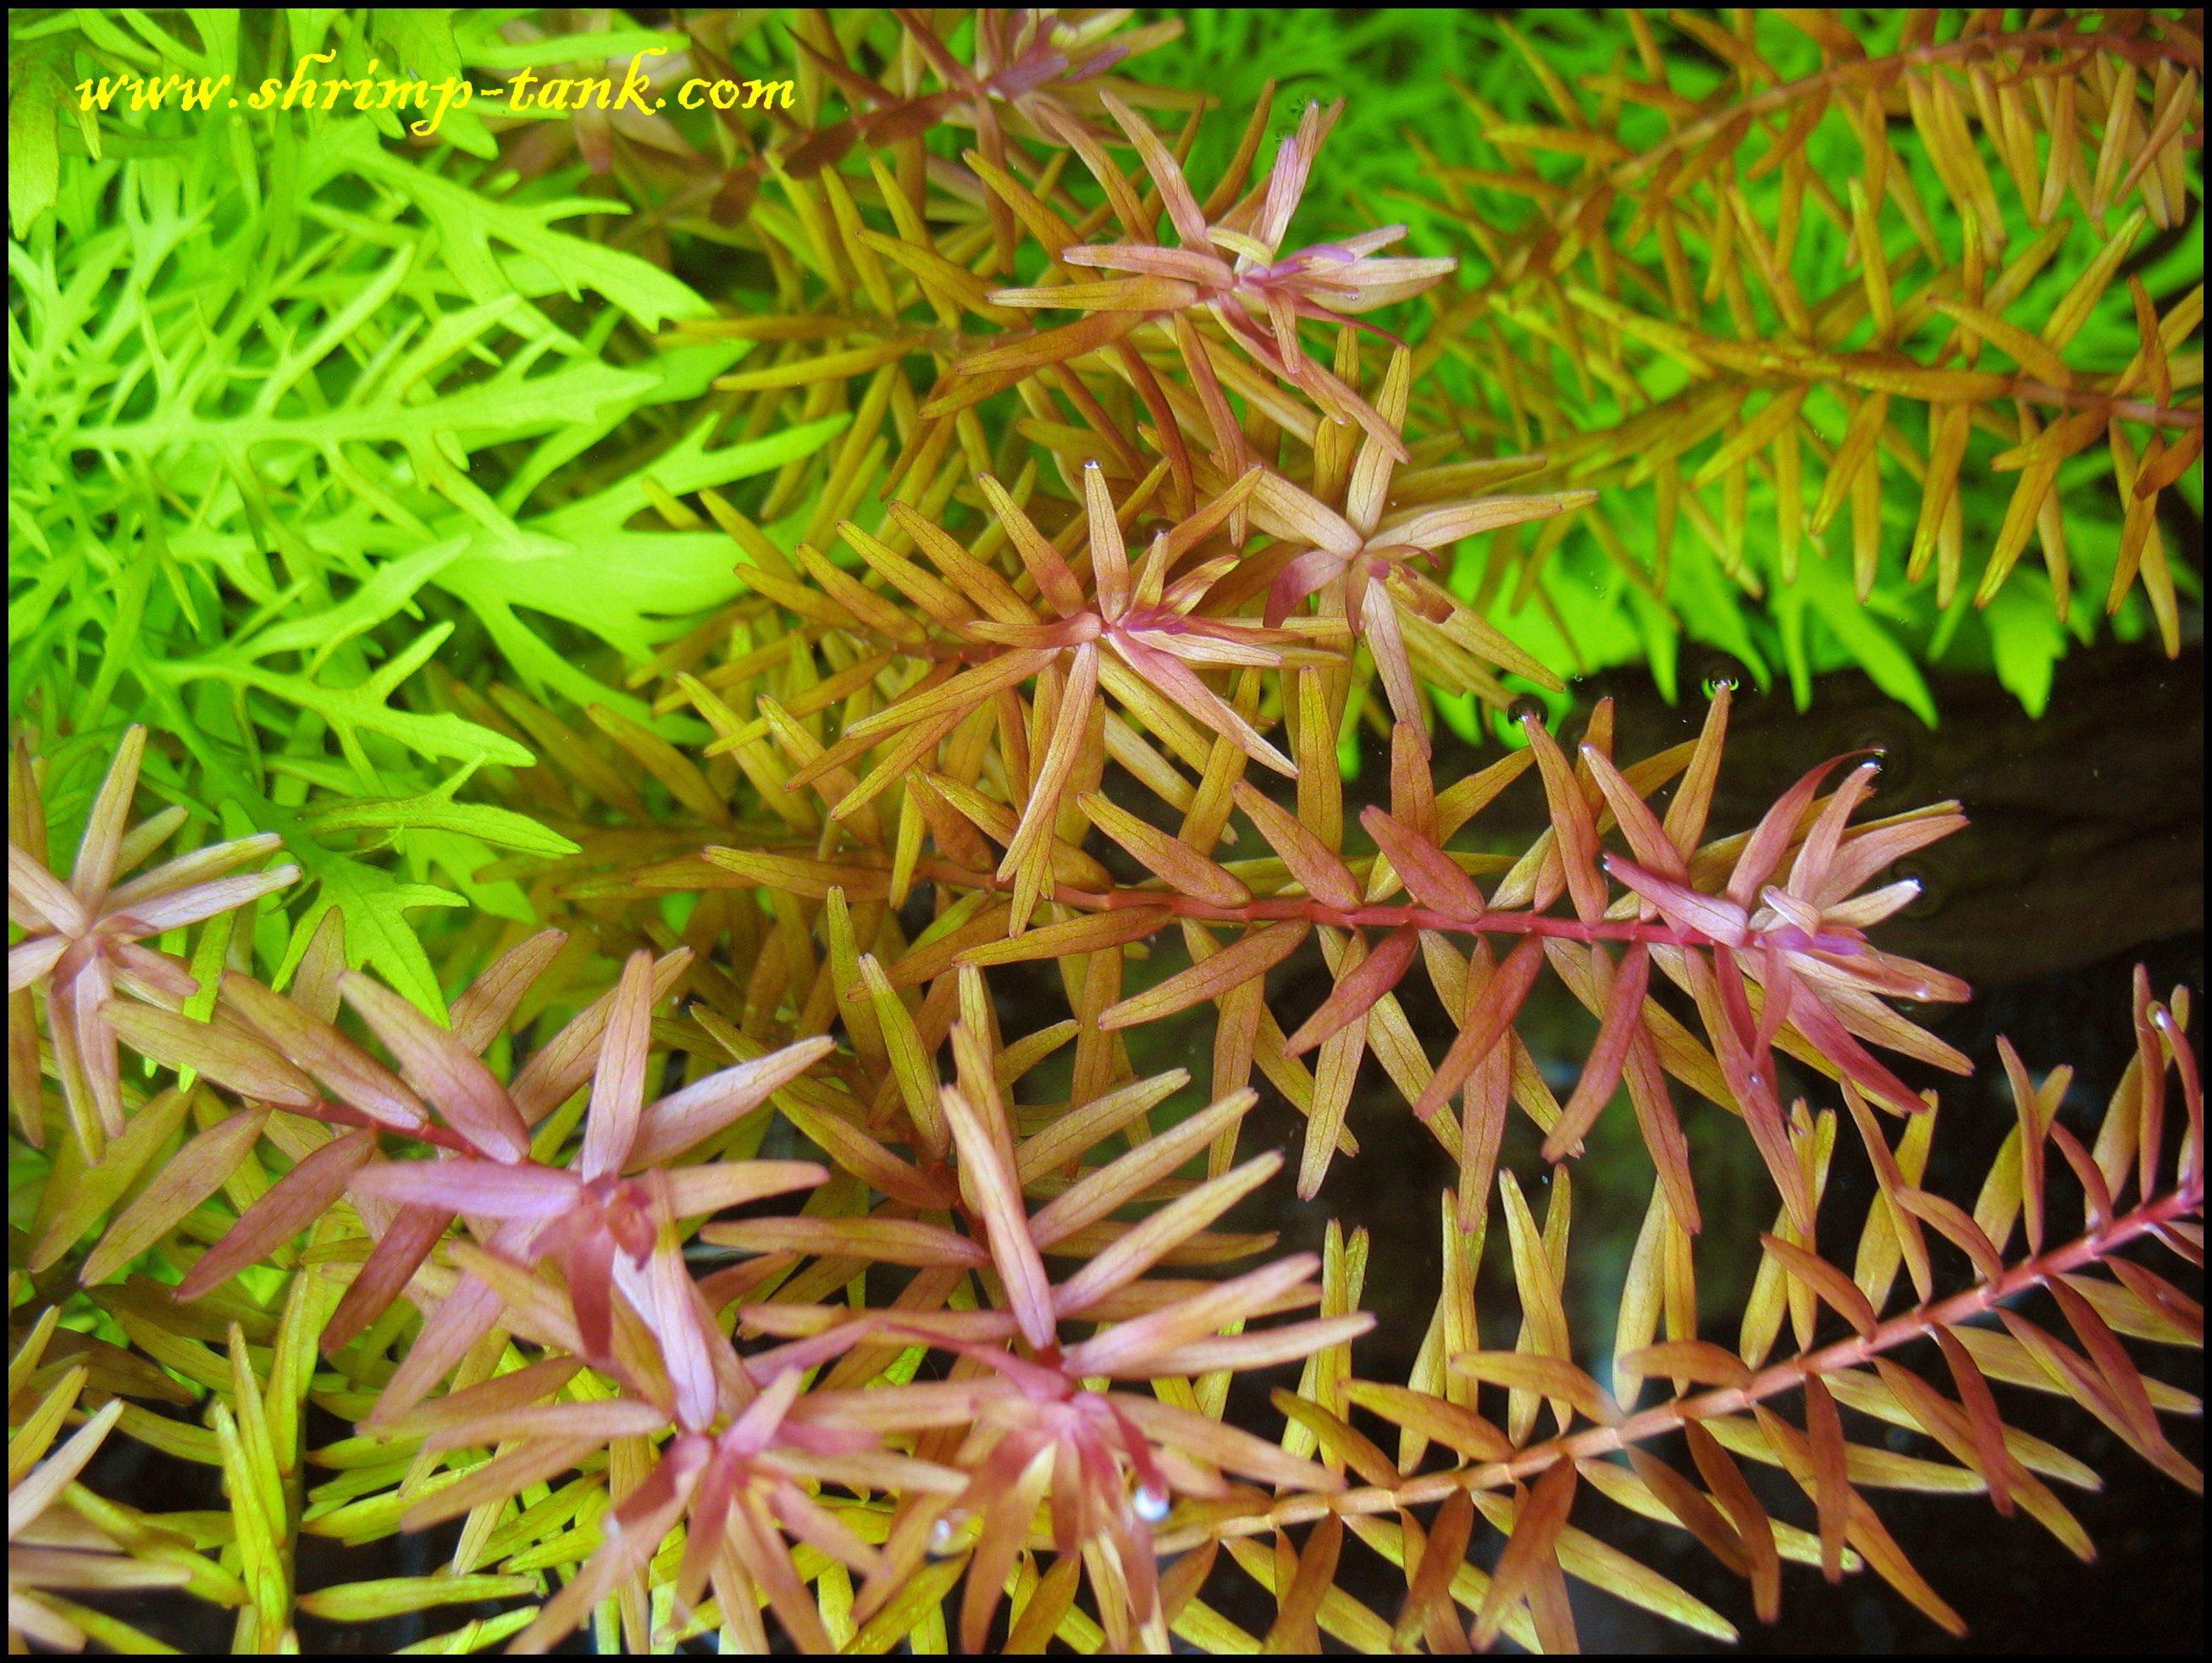 Rotala sp. Rotundifolia. Some more photos or a red plant @ Shrimp Tank